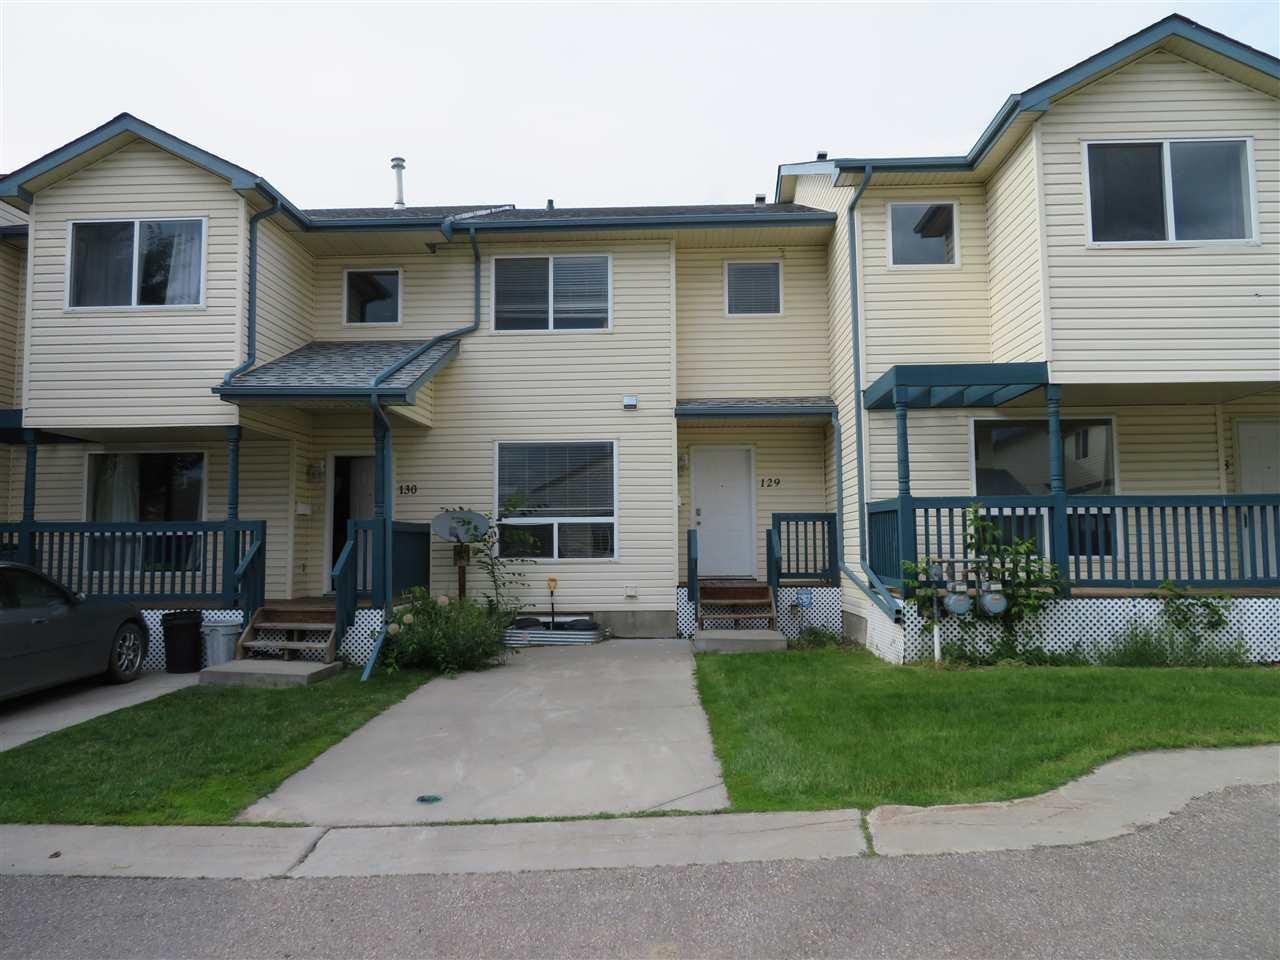 Main Photo: 129 10909 106 Street in Edmonton: Zone 08 Townhouse for sale : MLS®# E4164659